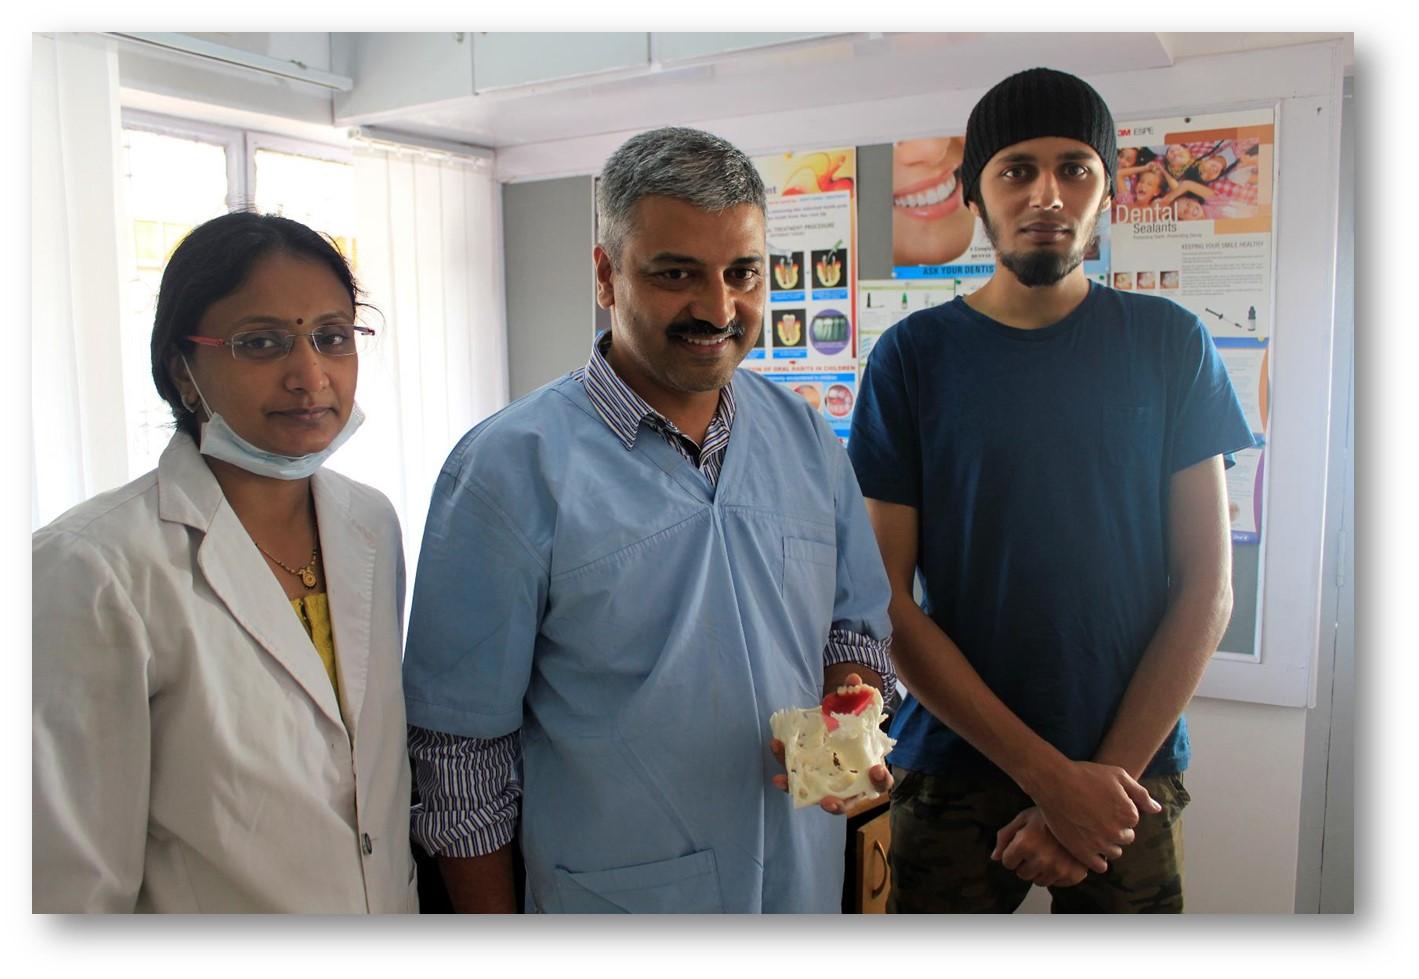 teeth implant osteo3d 3d printing